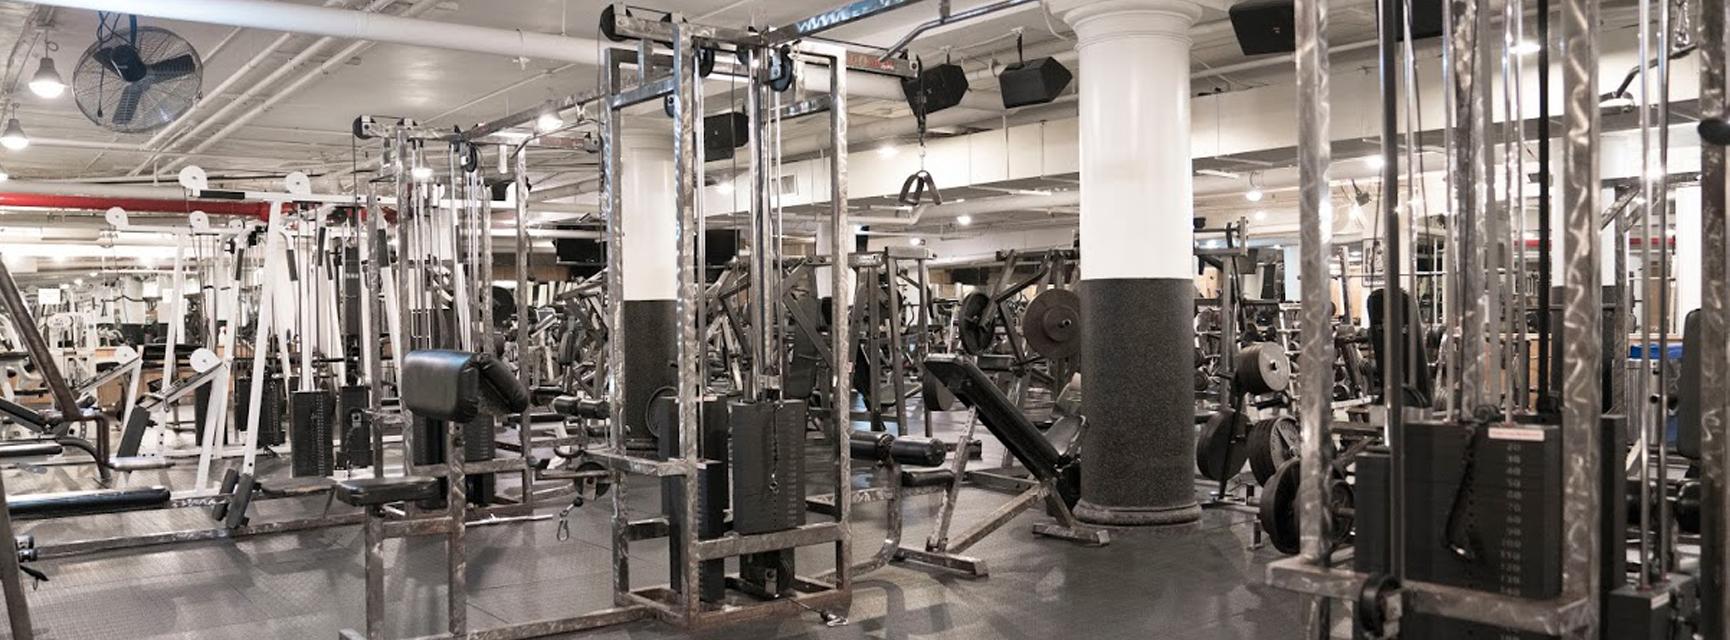 Chelsea Gym